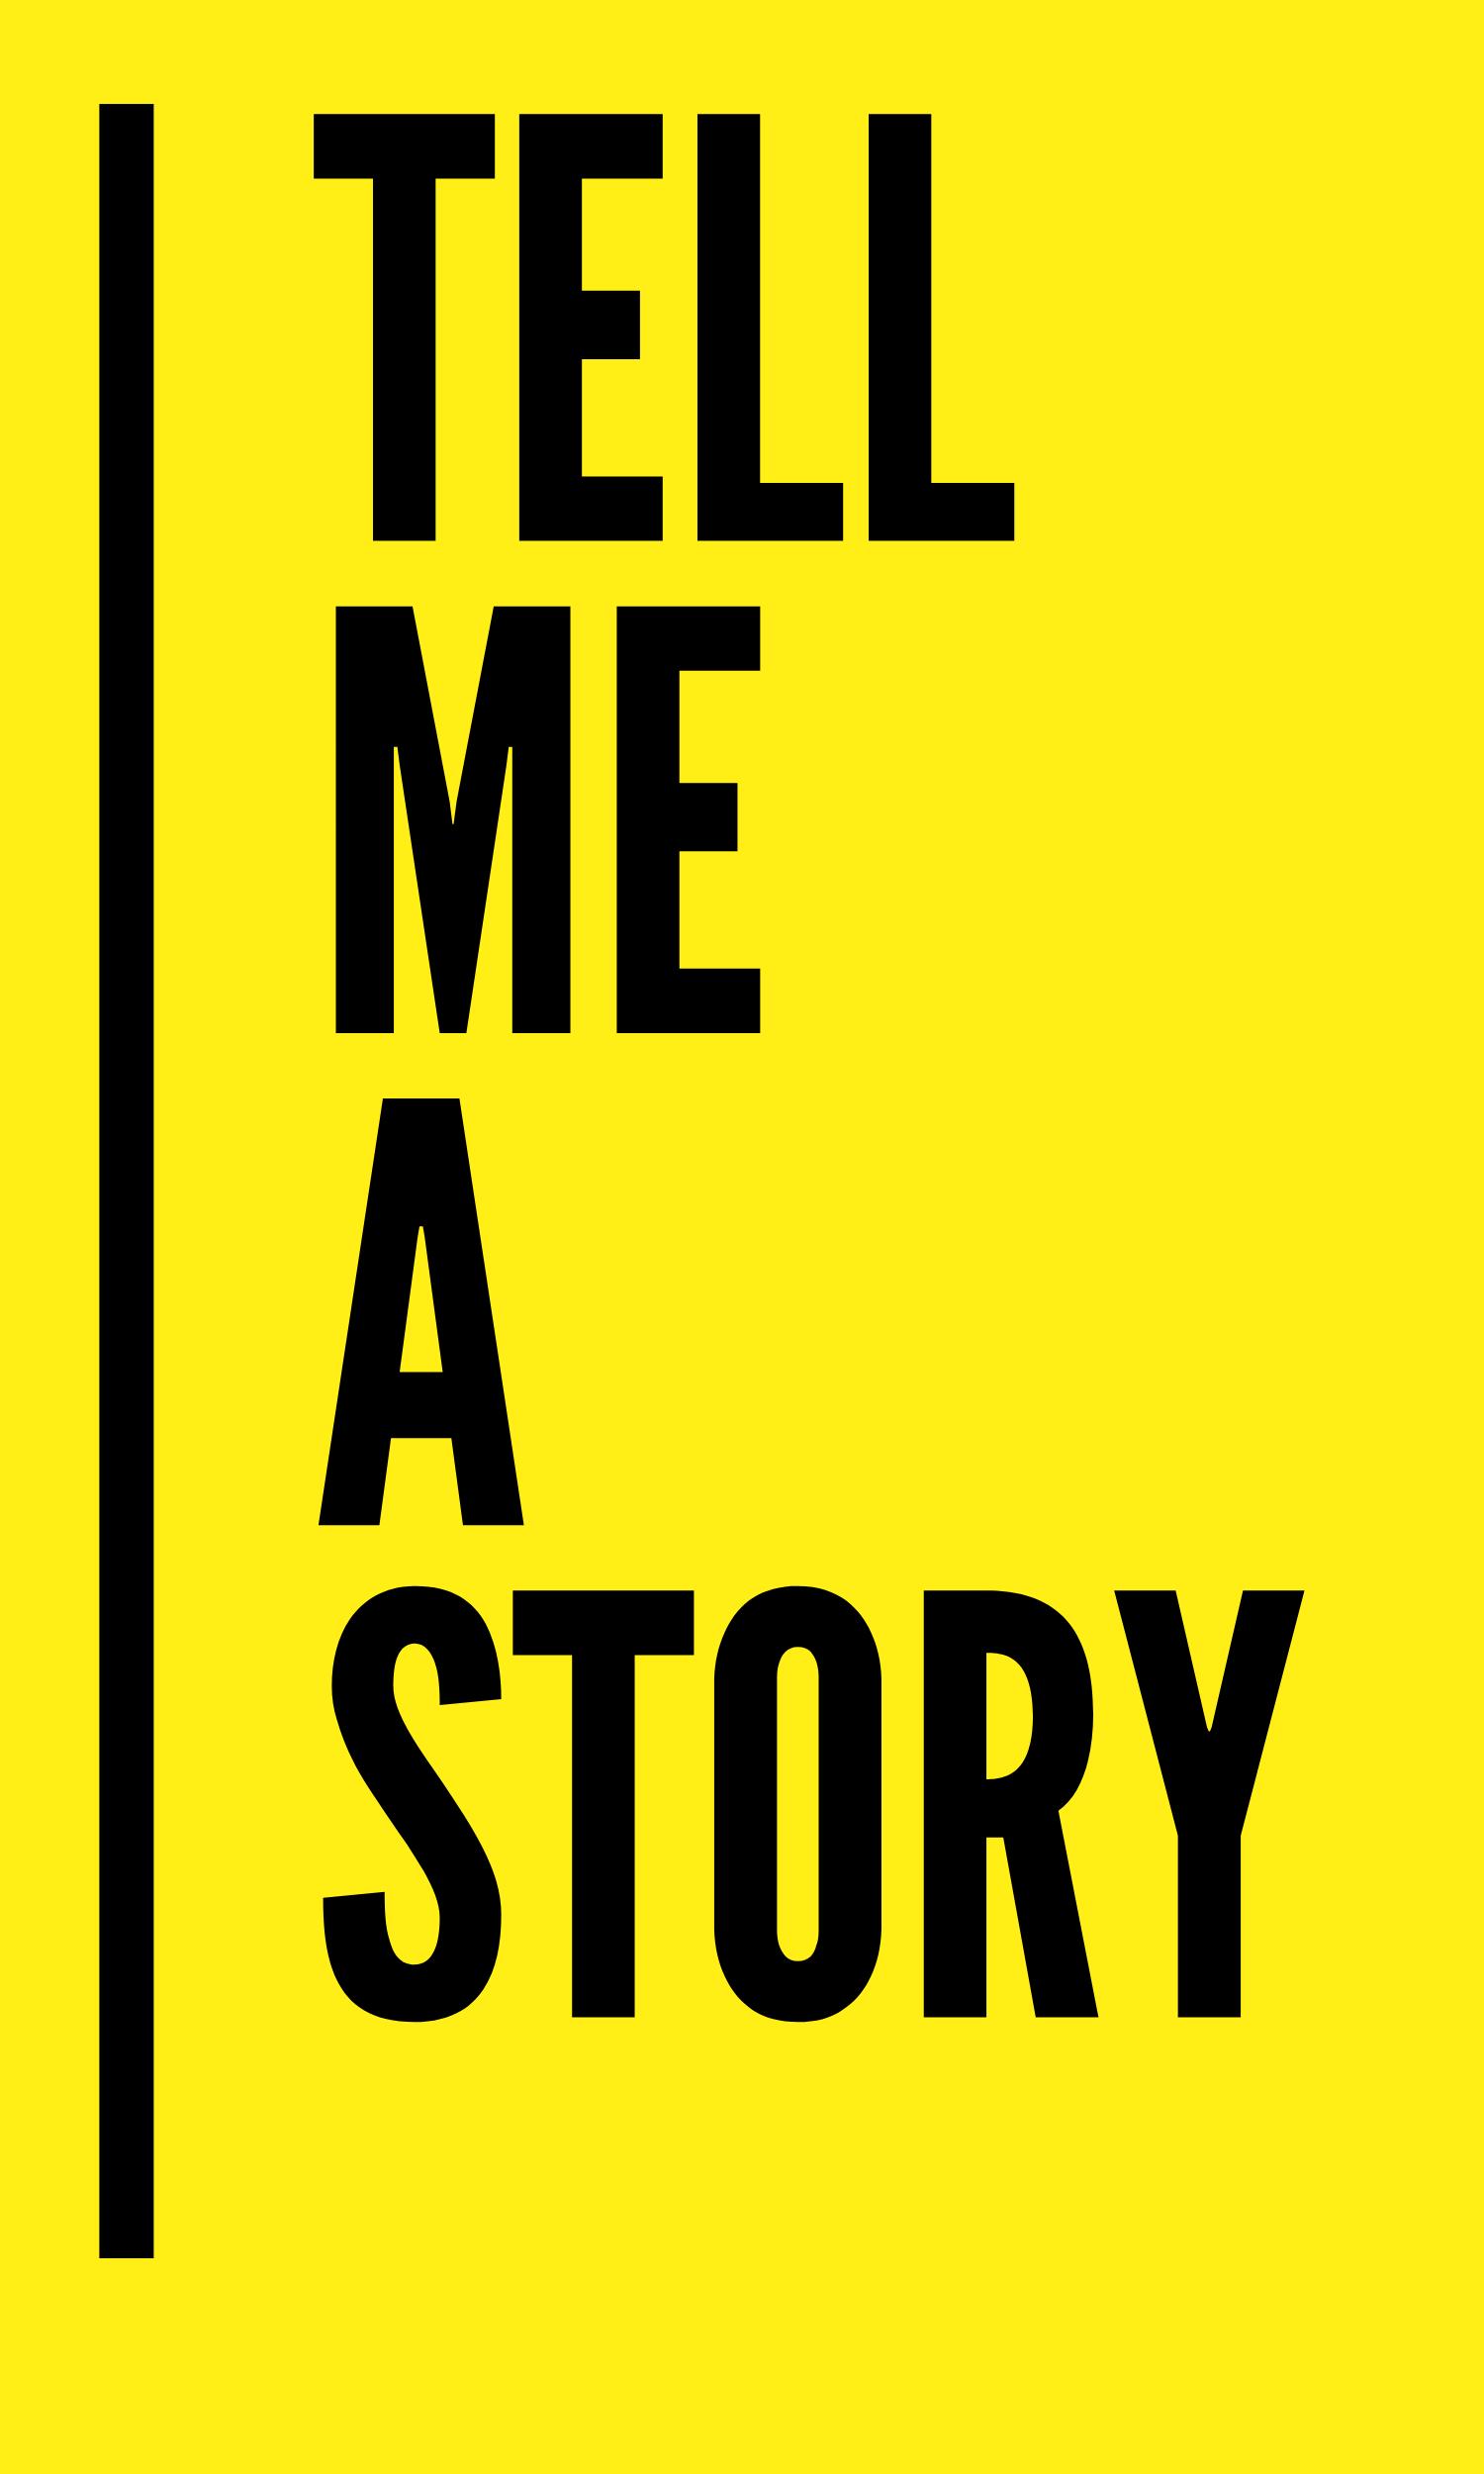 tellmeastory (1).png